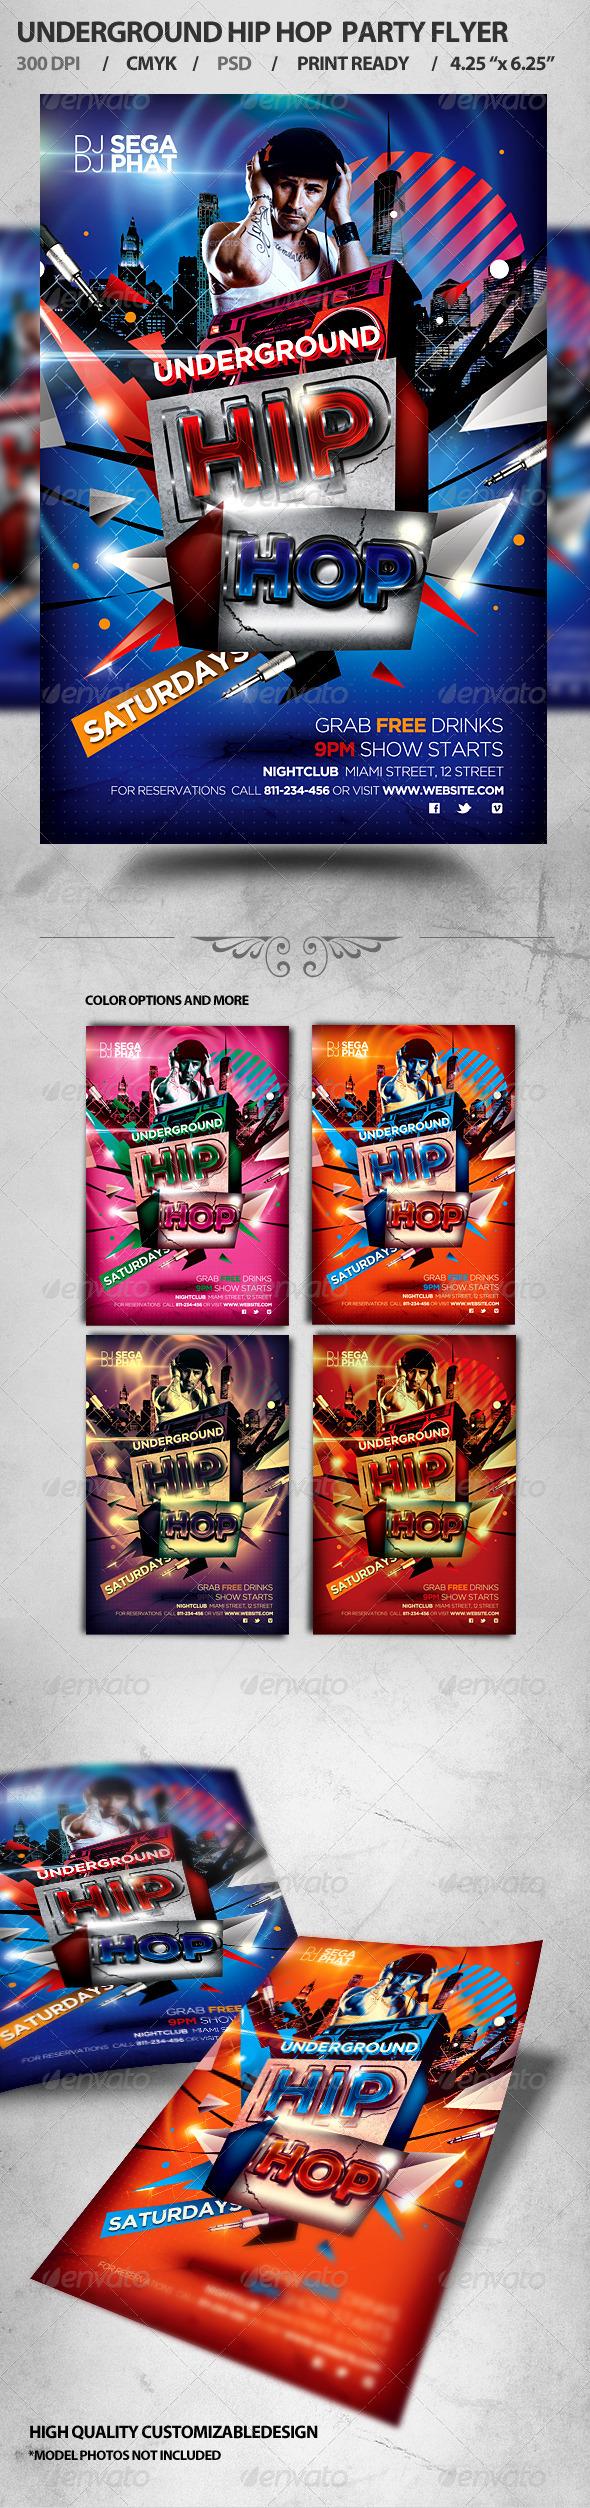 Underground Hip Hop Party Flyer - Flyers Print Templates